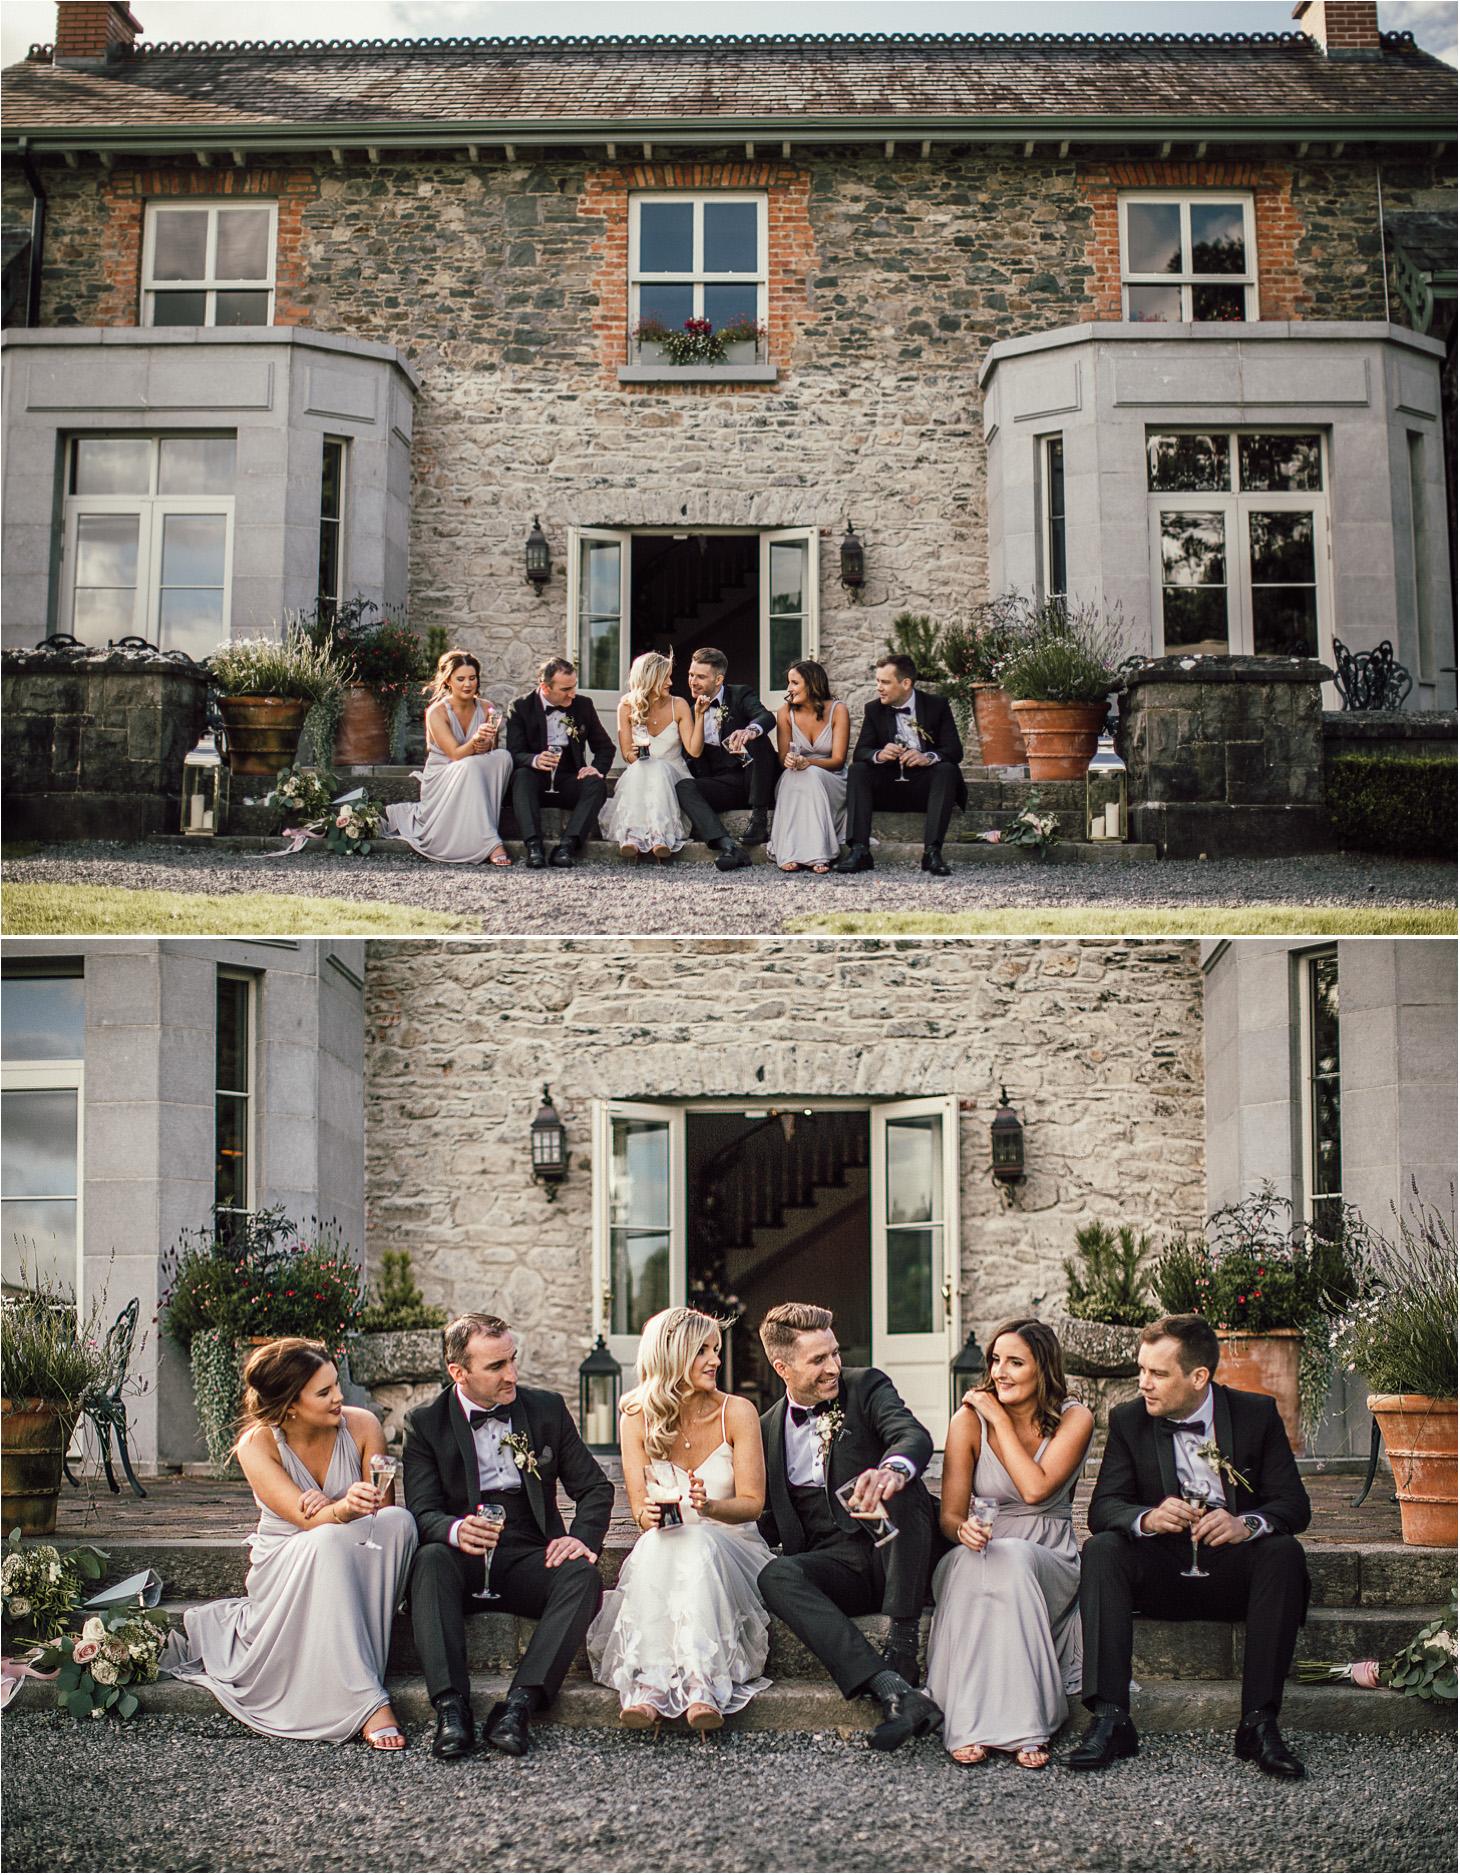 Virgina Lodge Photography. darren fitzpatrick. Wedding.25